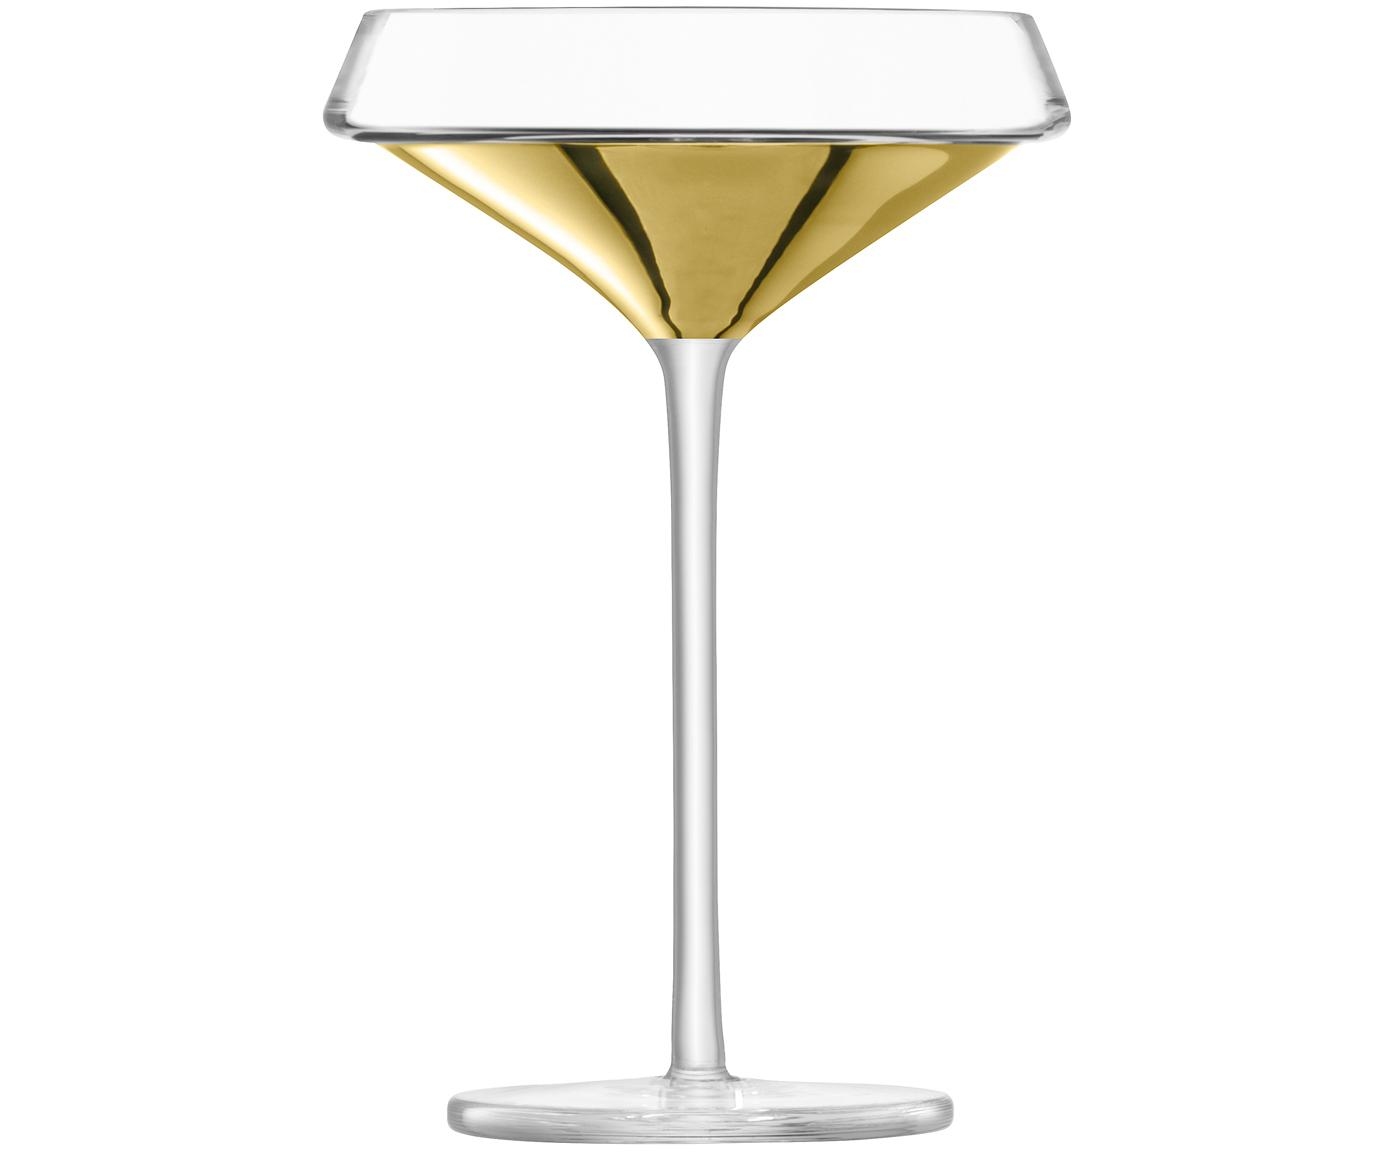 Coppa champagne in vetro soffiato Space 2 pz, Vetro, Trasparente, dorato, Ø 12 x Alt. 18 cm